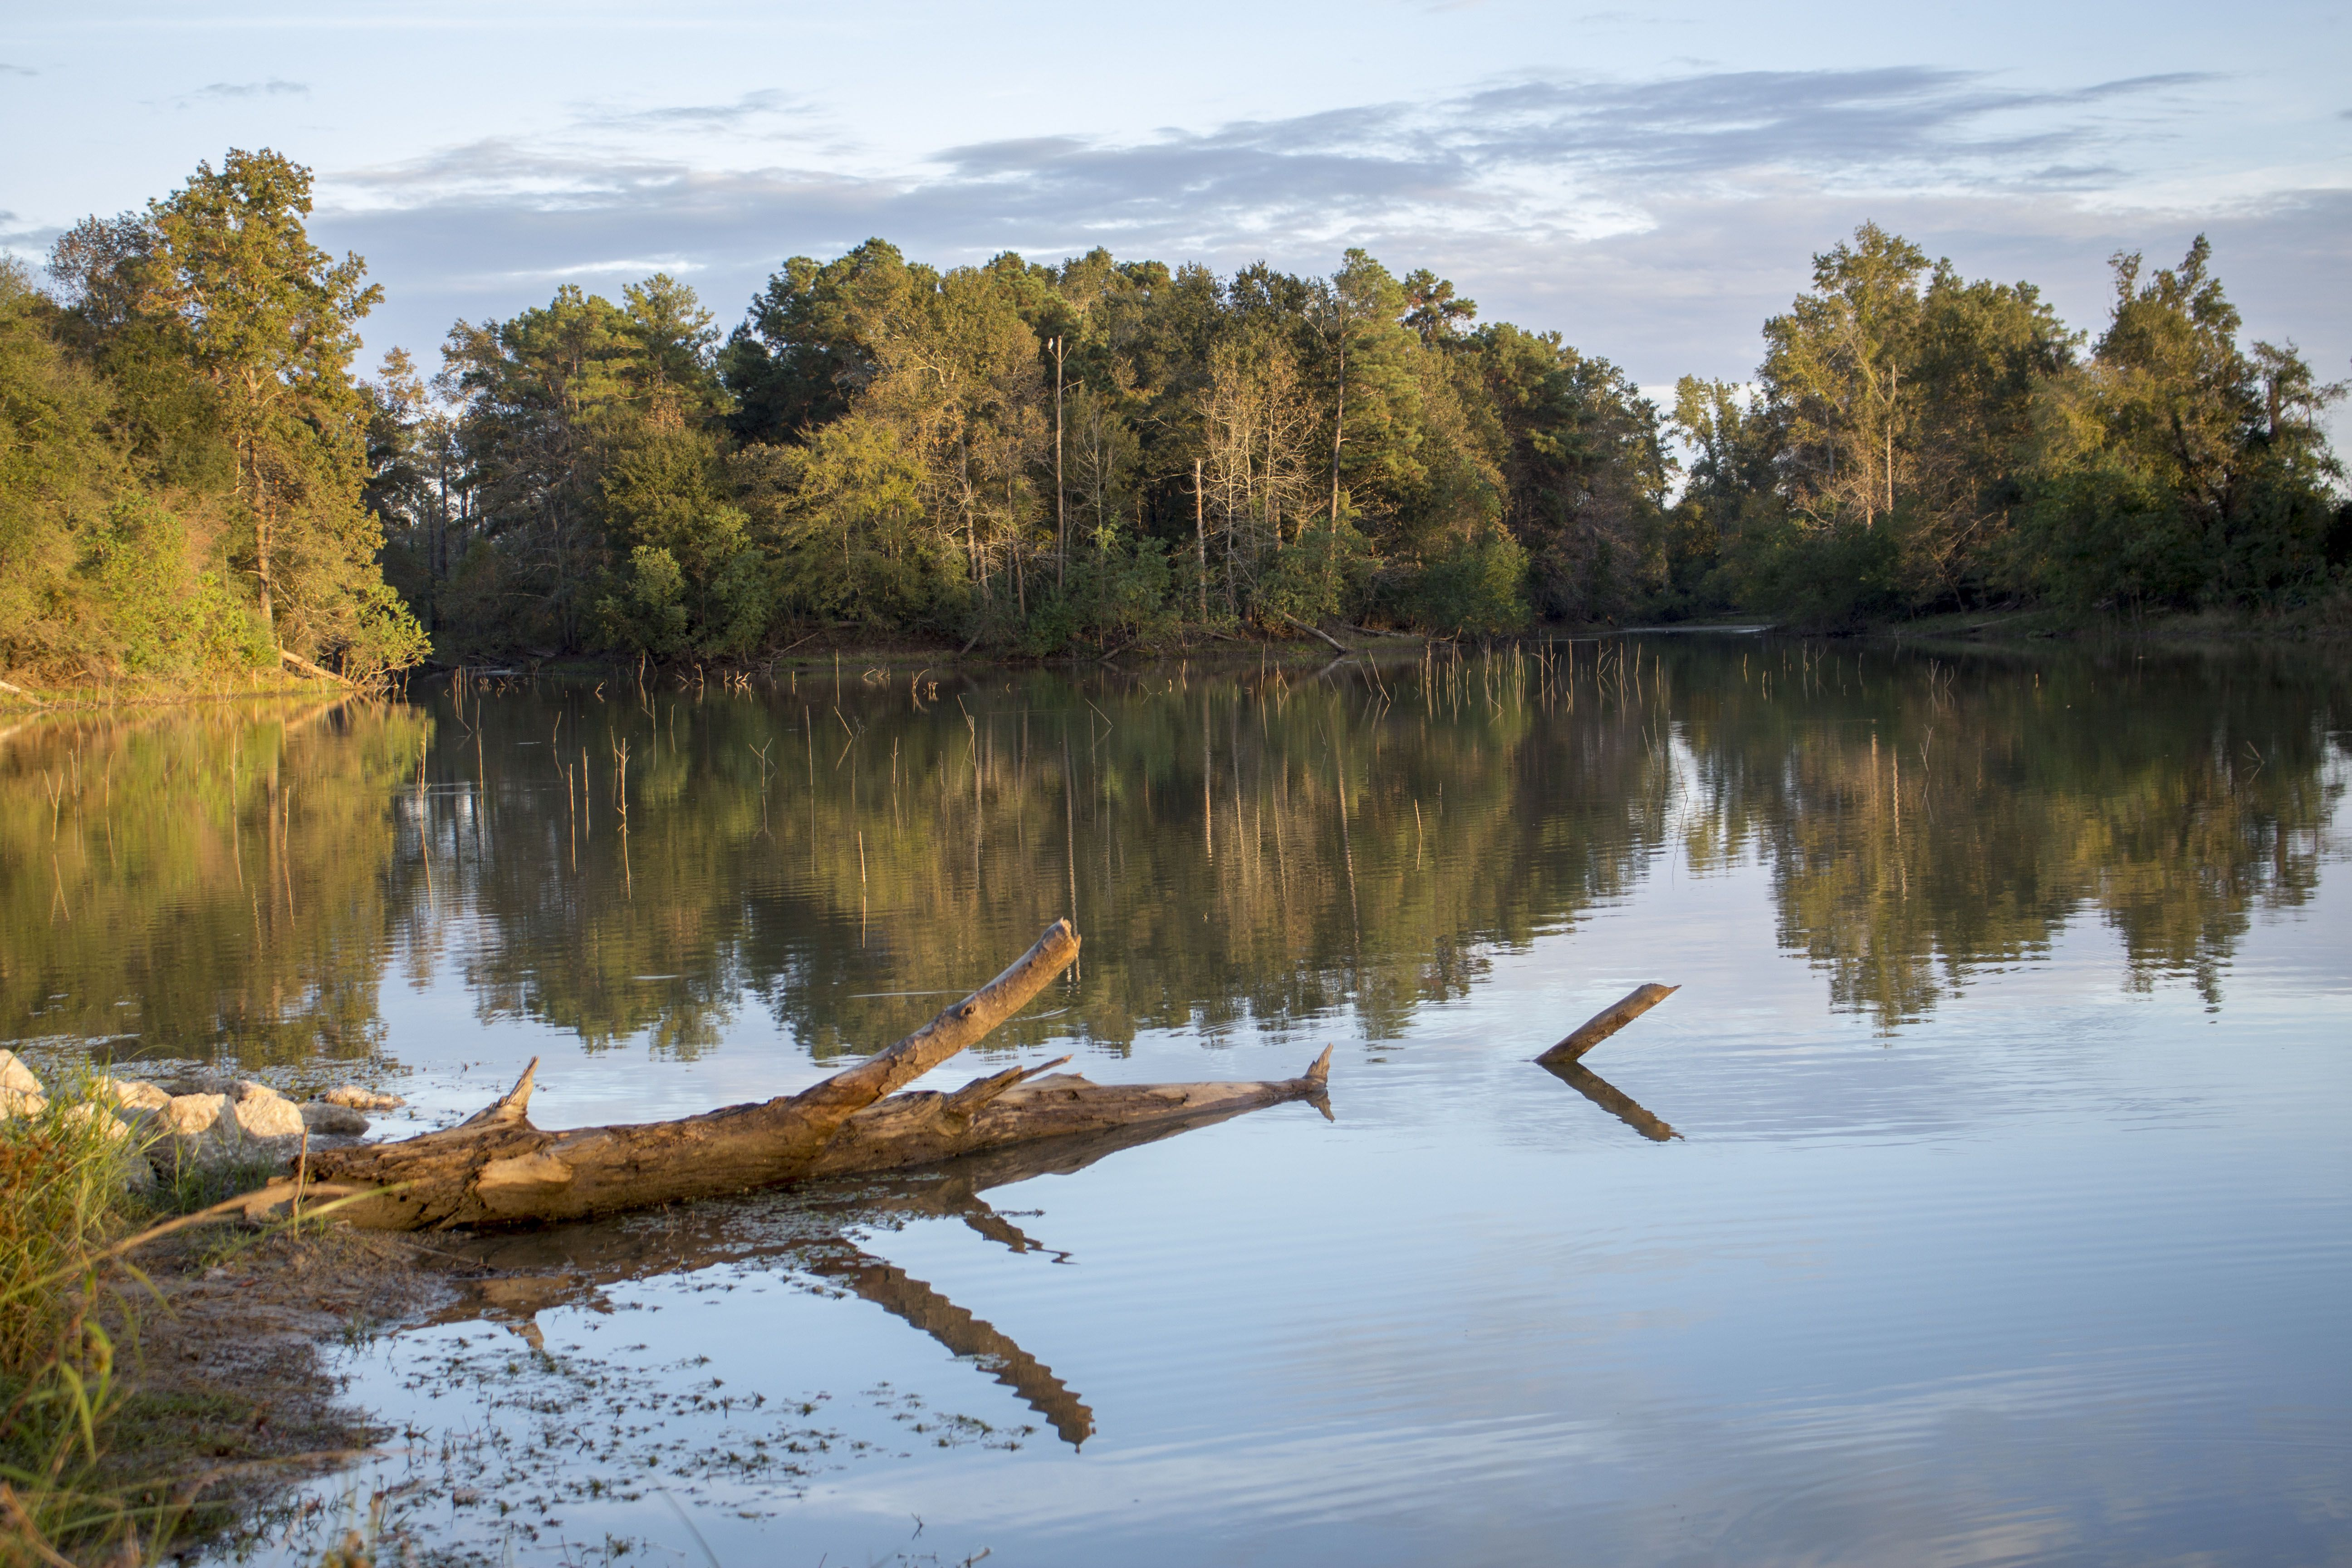 Kickerillomischer preserve 20207 chasewood park dr